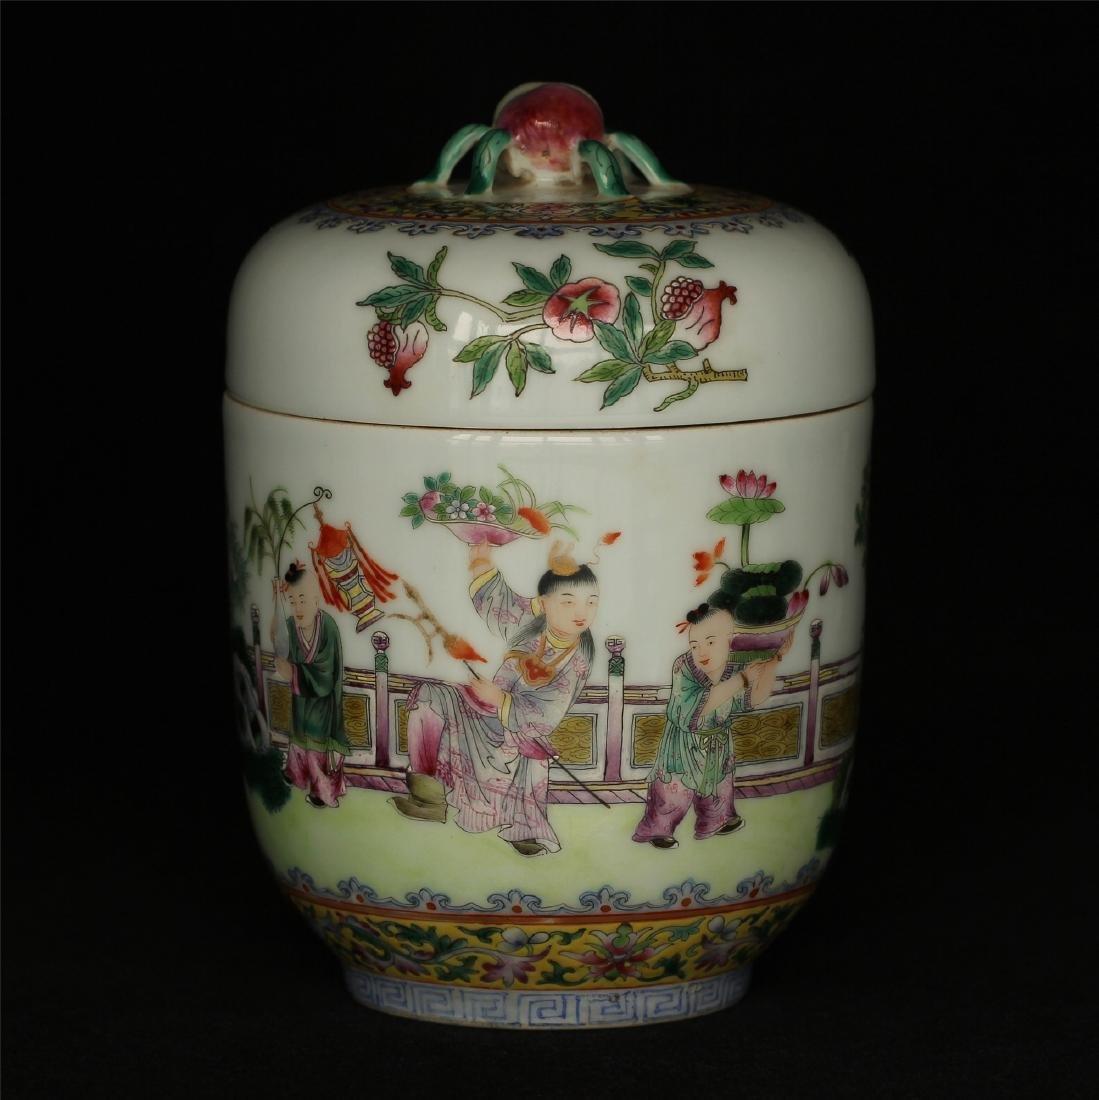 Famille rose porcelain jar of Qing Dynasty JiaQing